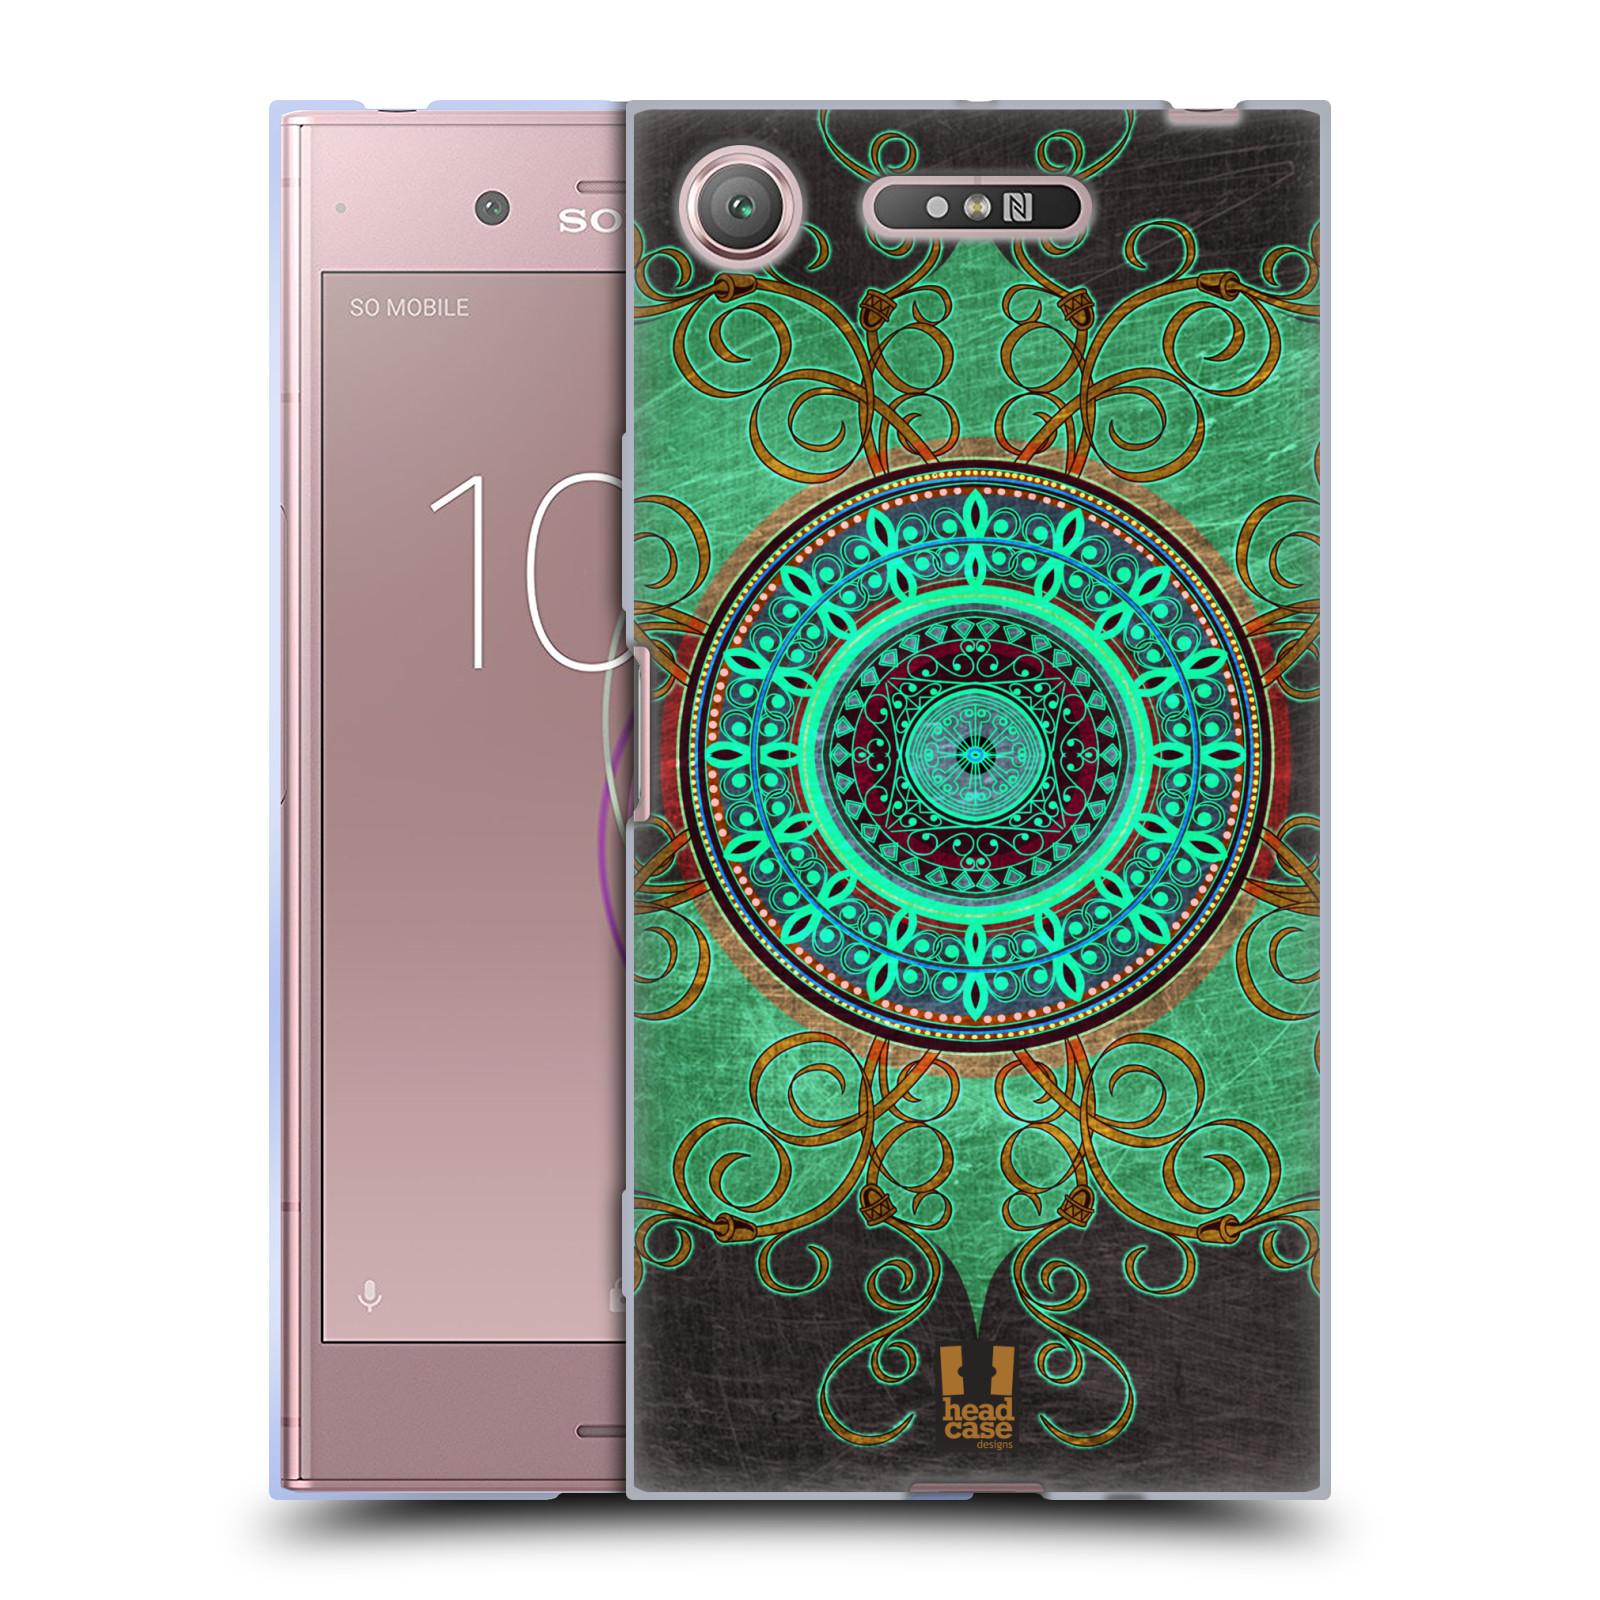 Silikonové pouzdro na mobil Sony Xperia XZ1 - Head Case - ARAB MANDALA